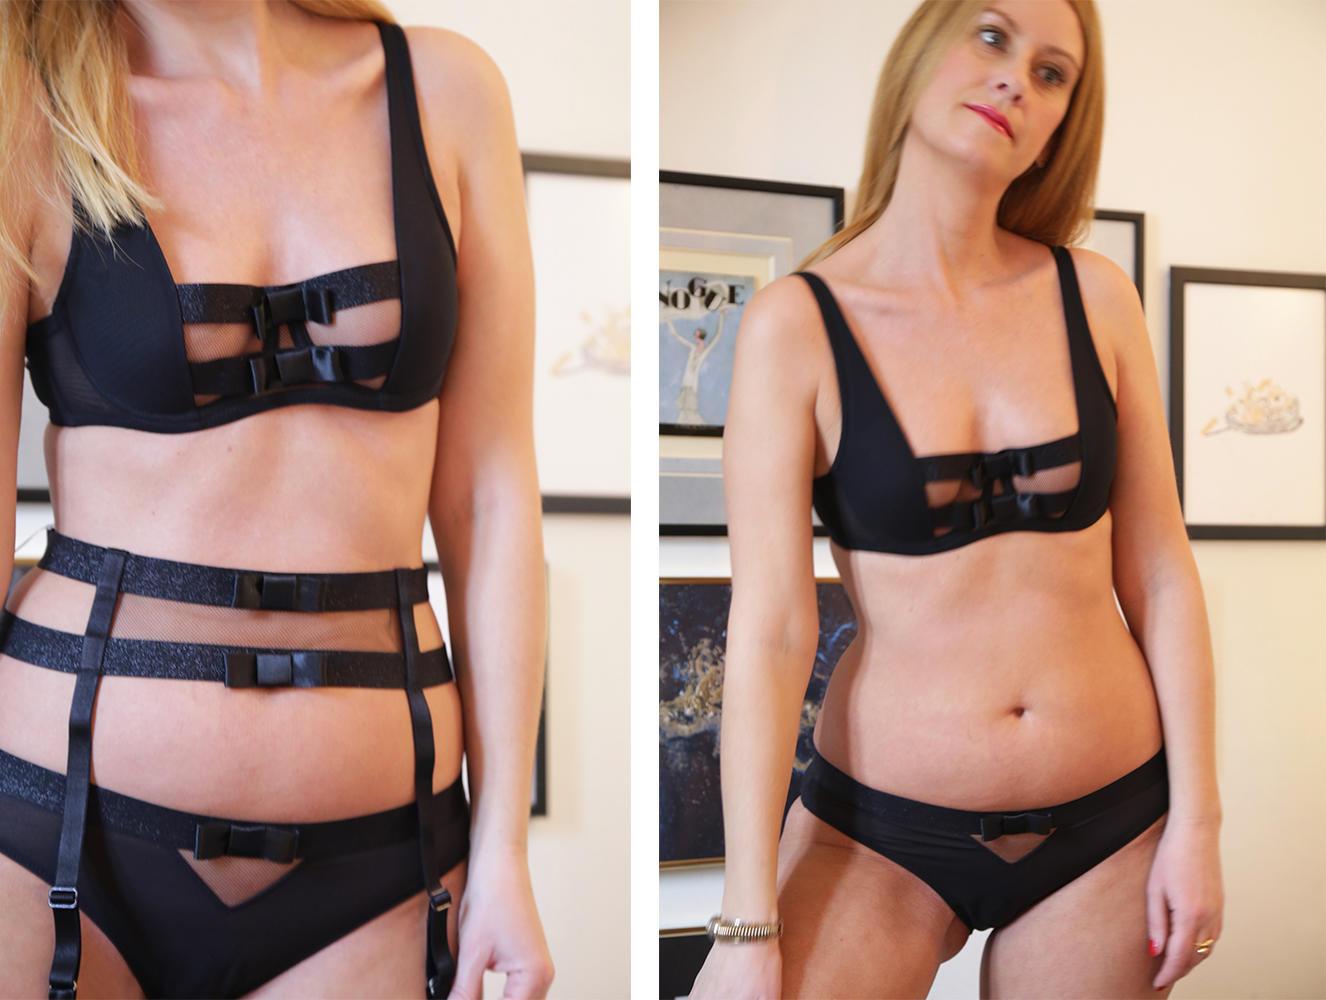 glamuse lingerie-ensemble lingerie Chantal Thomass